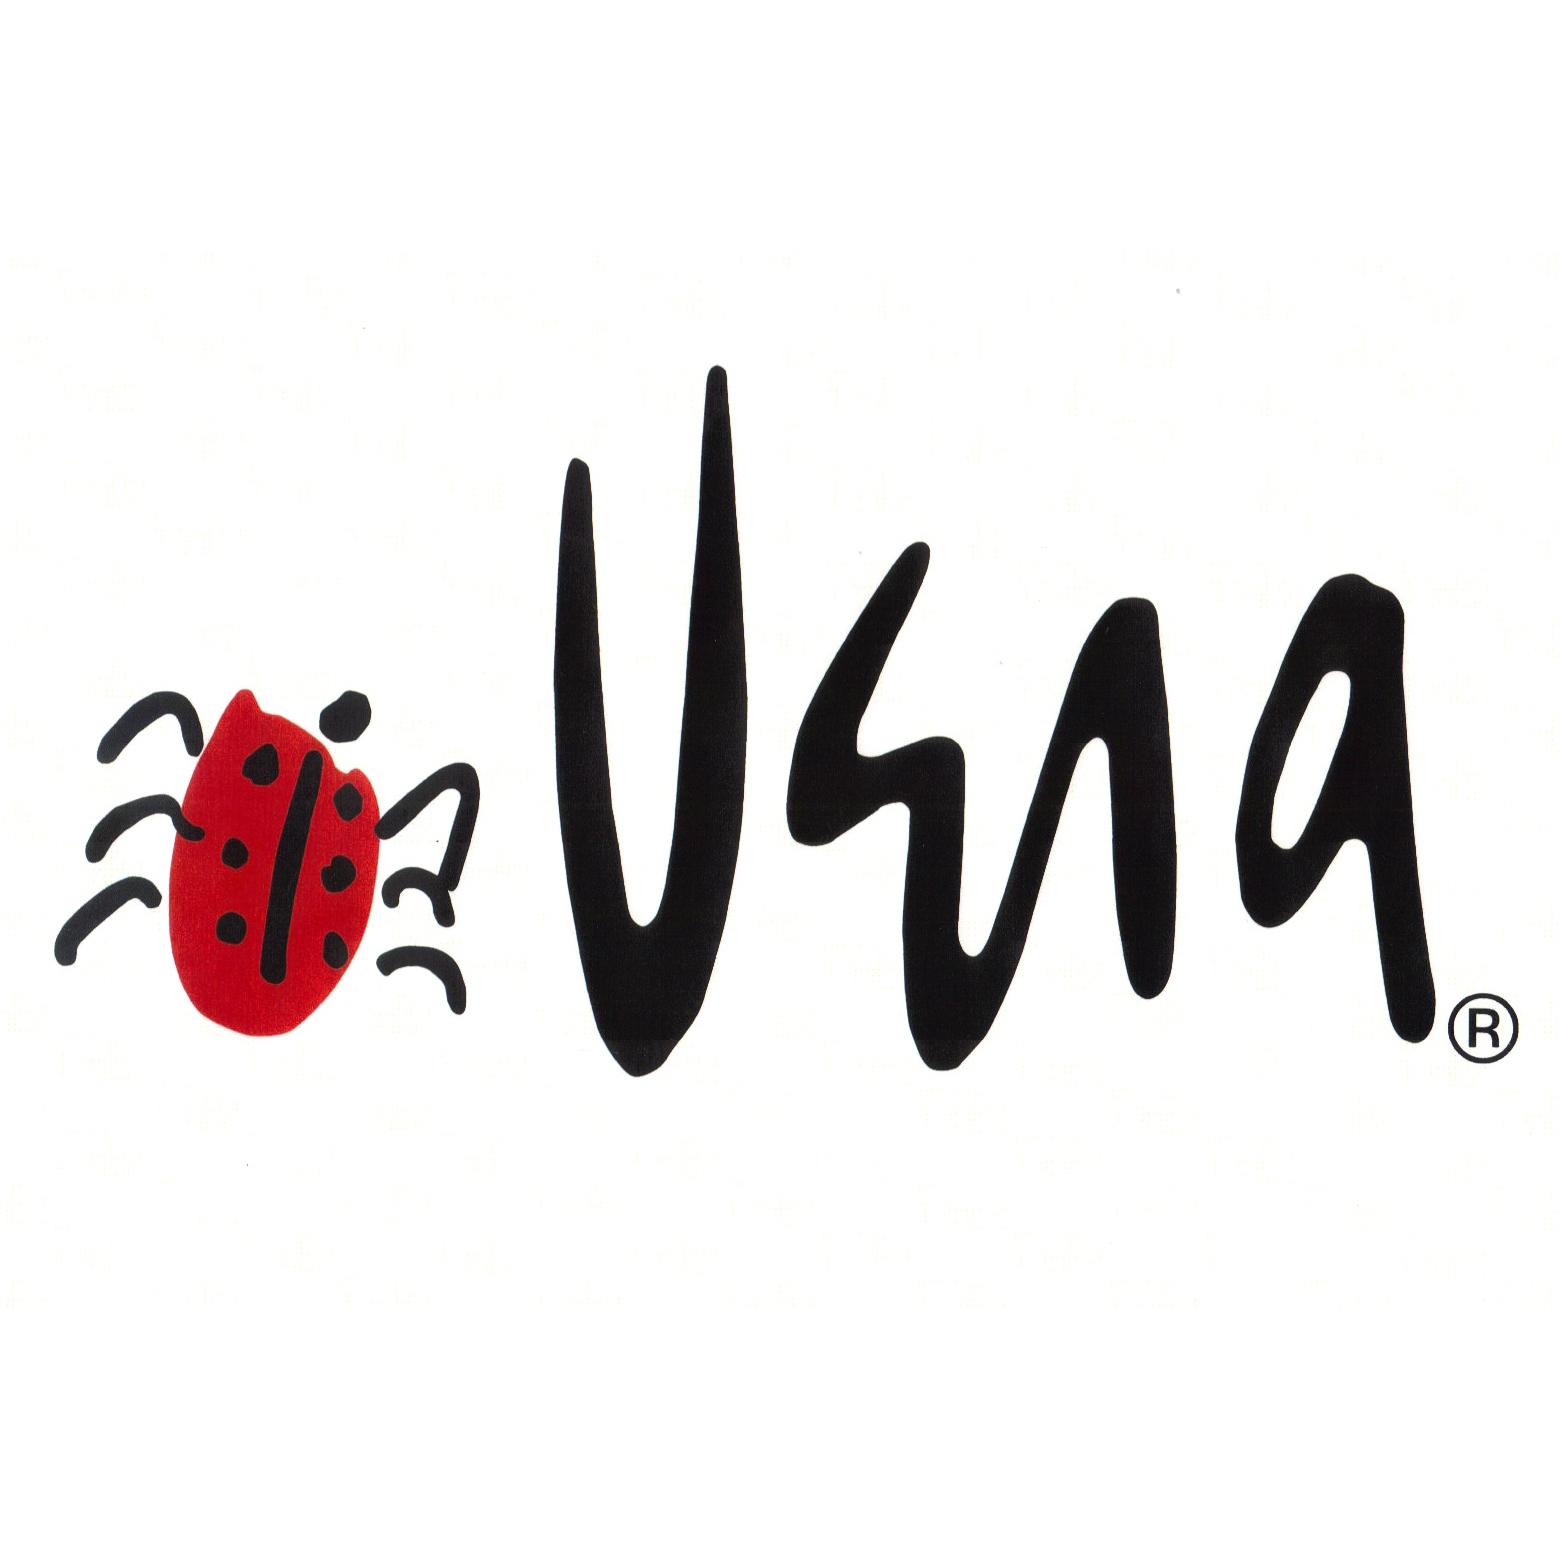 The Vera Company